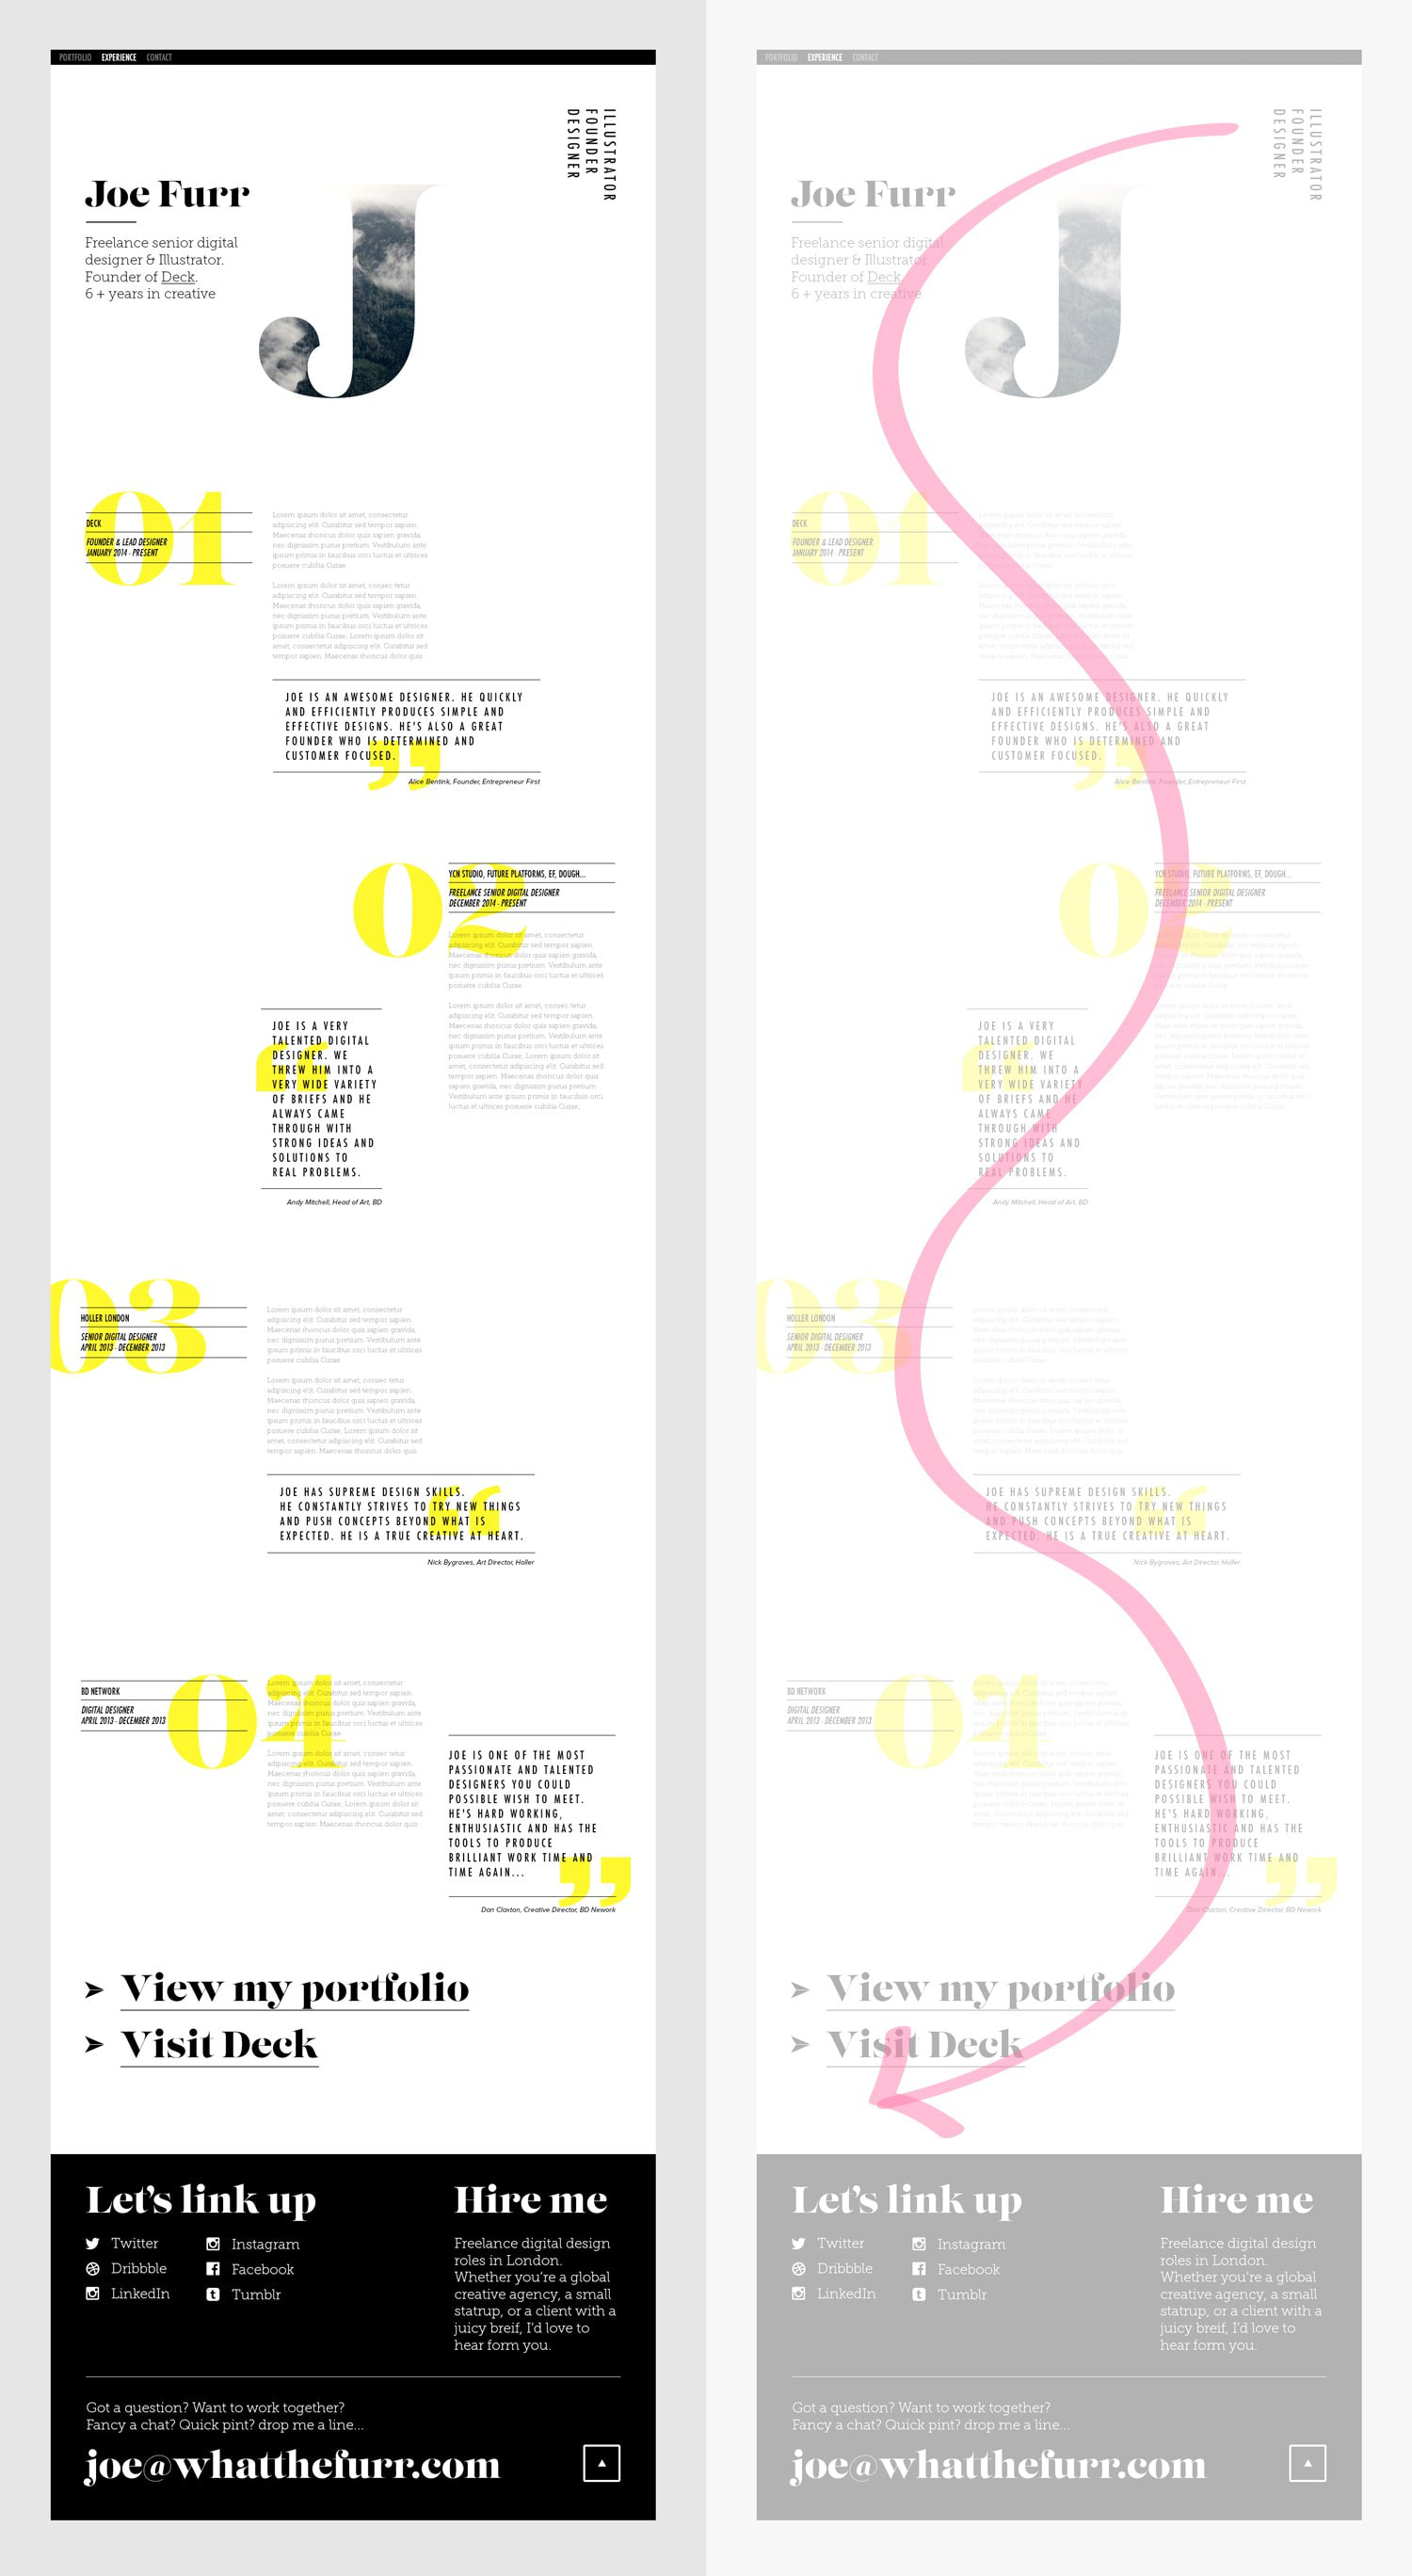 design-principles-19